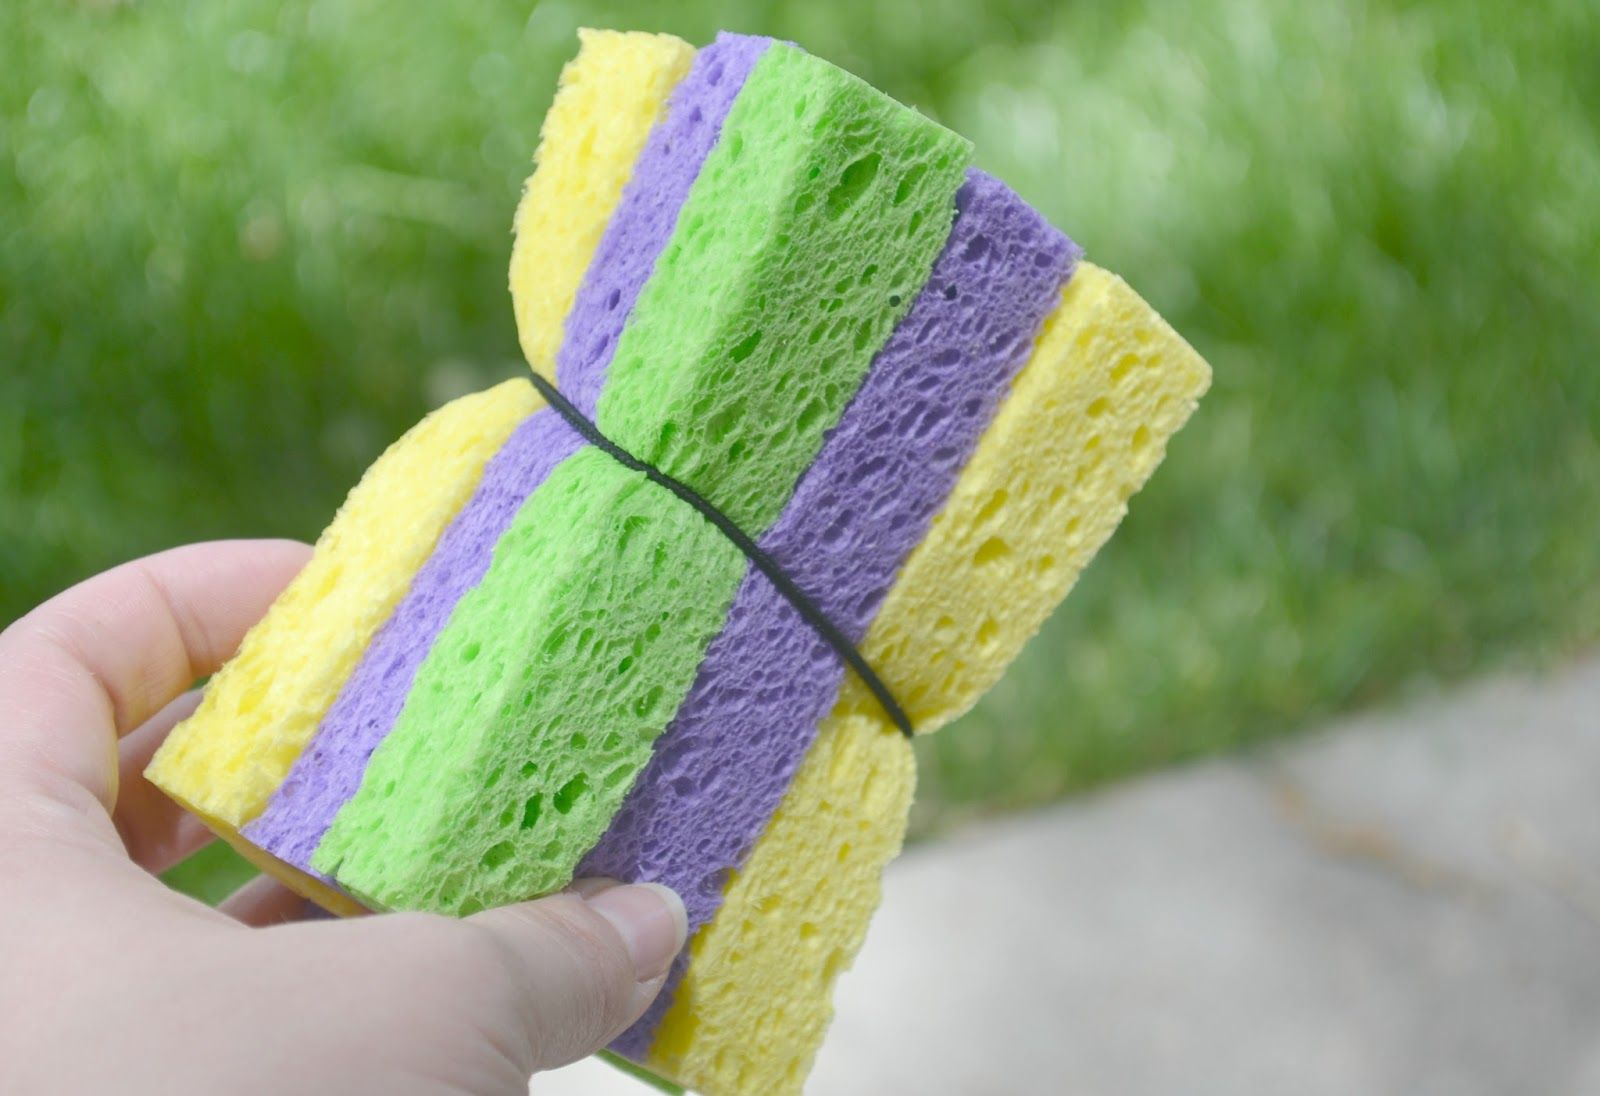 make your own sponge bombs kid backyard games and sponge bombs